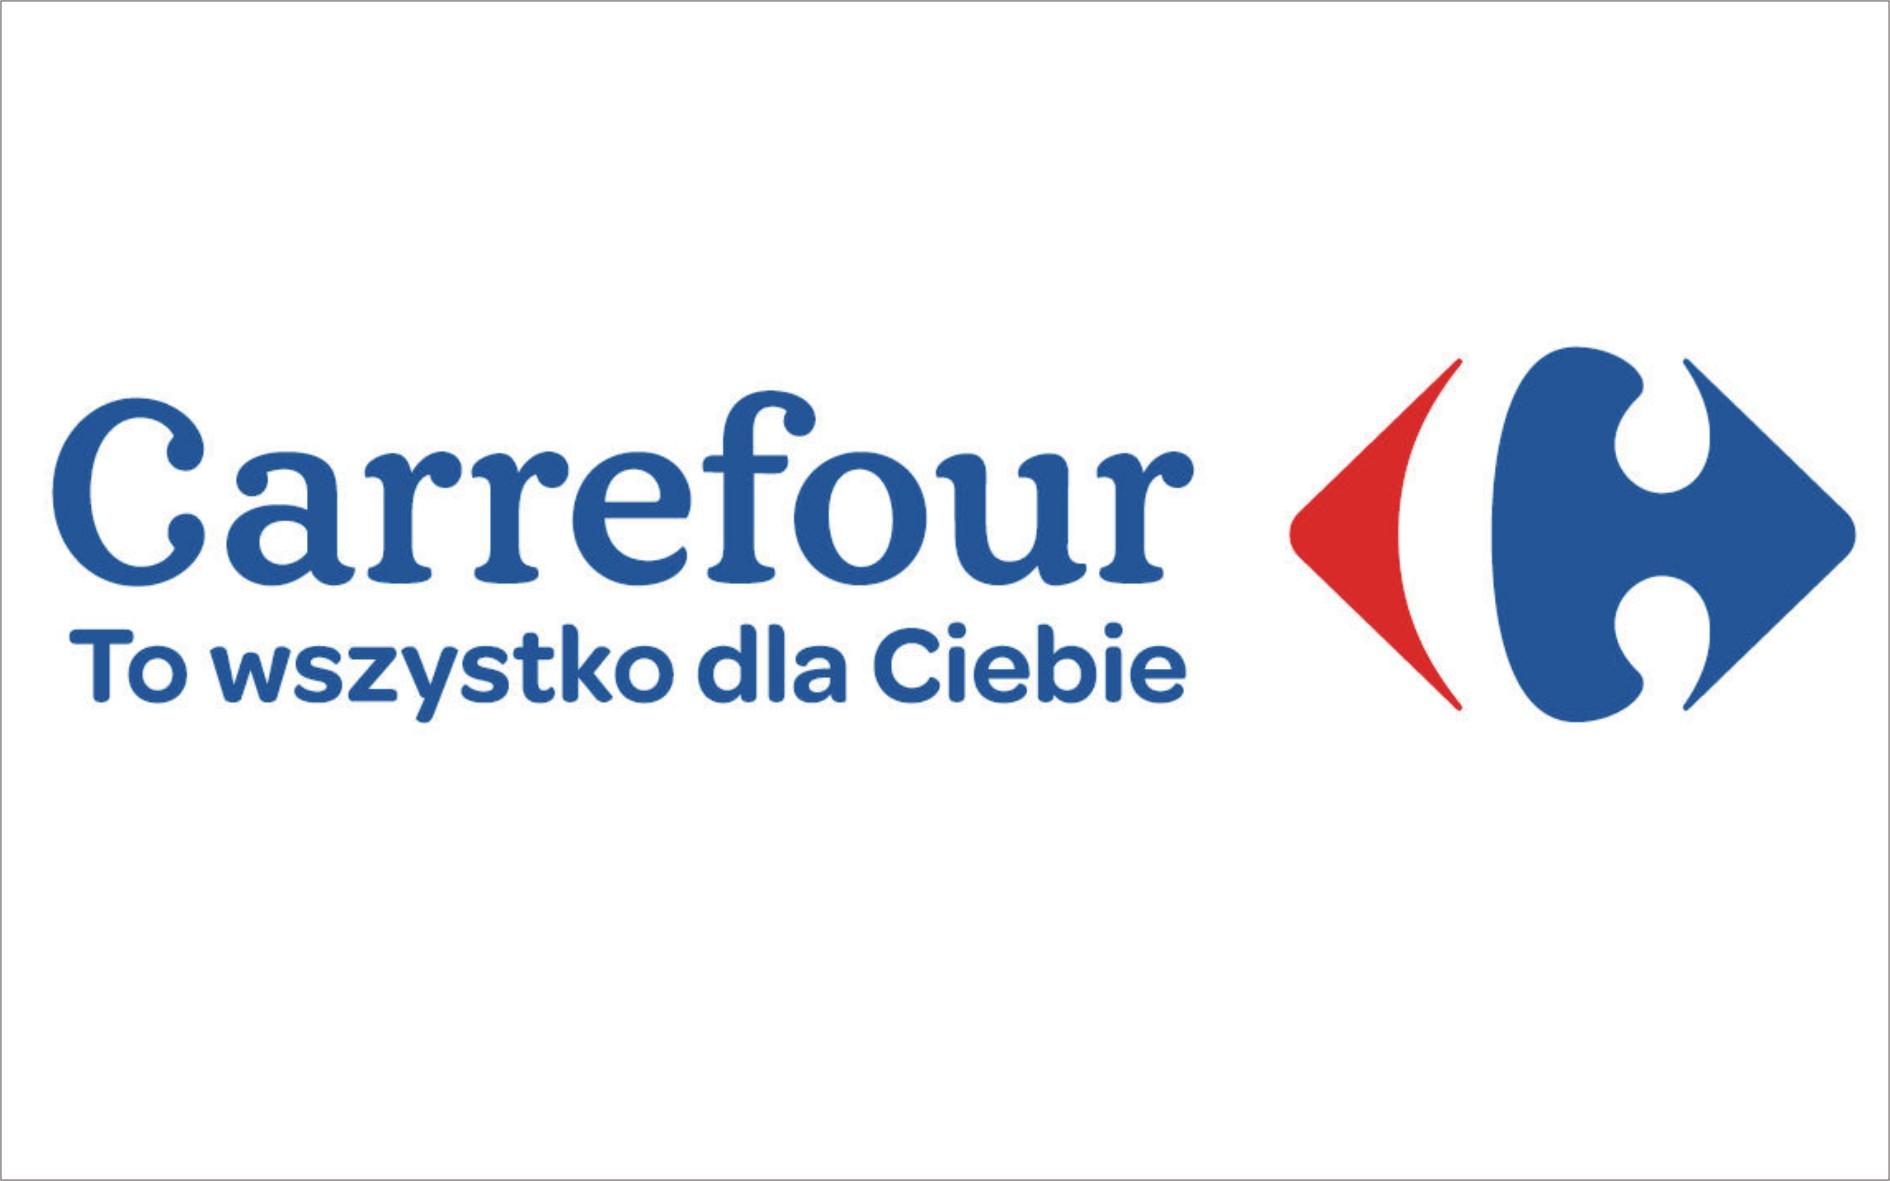 https://sklep.carrefour.pl/913482-carrefour-bydgoszcz-fordon